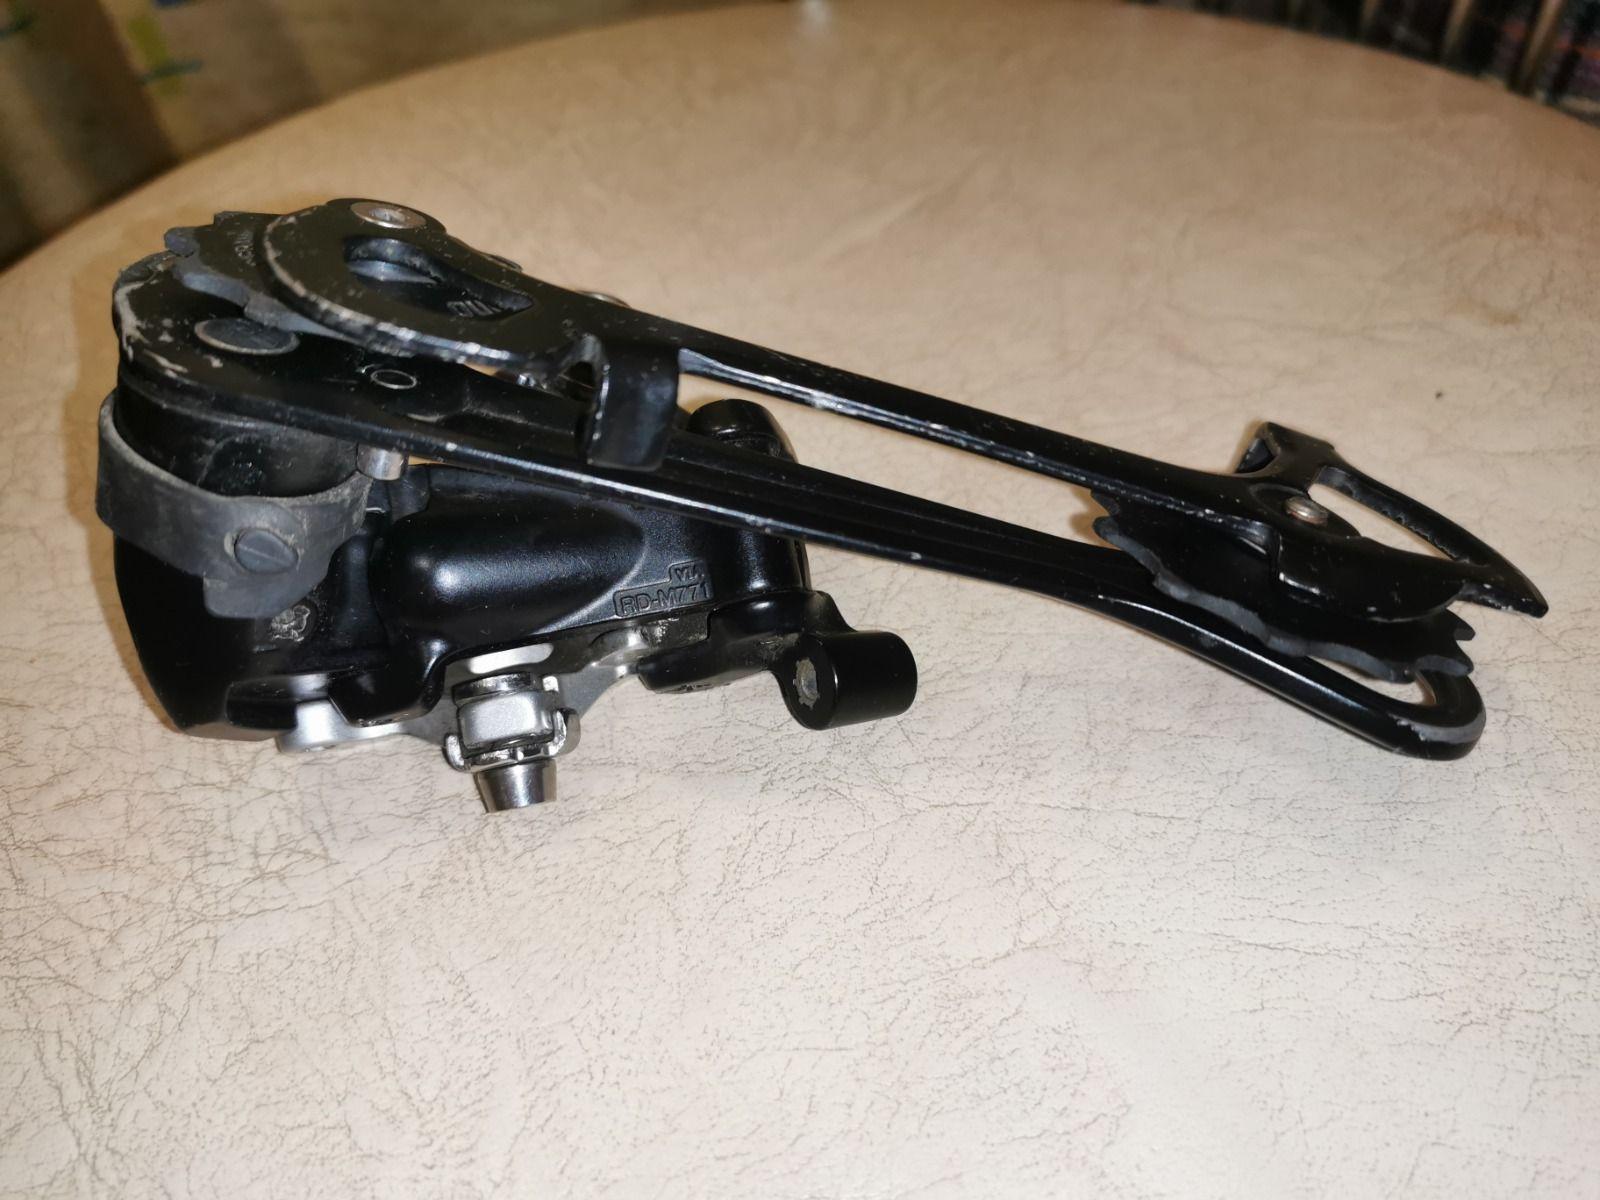 Задний переключатель Shimano XT 9 ск